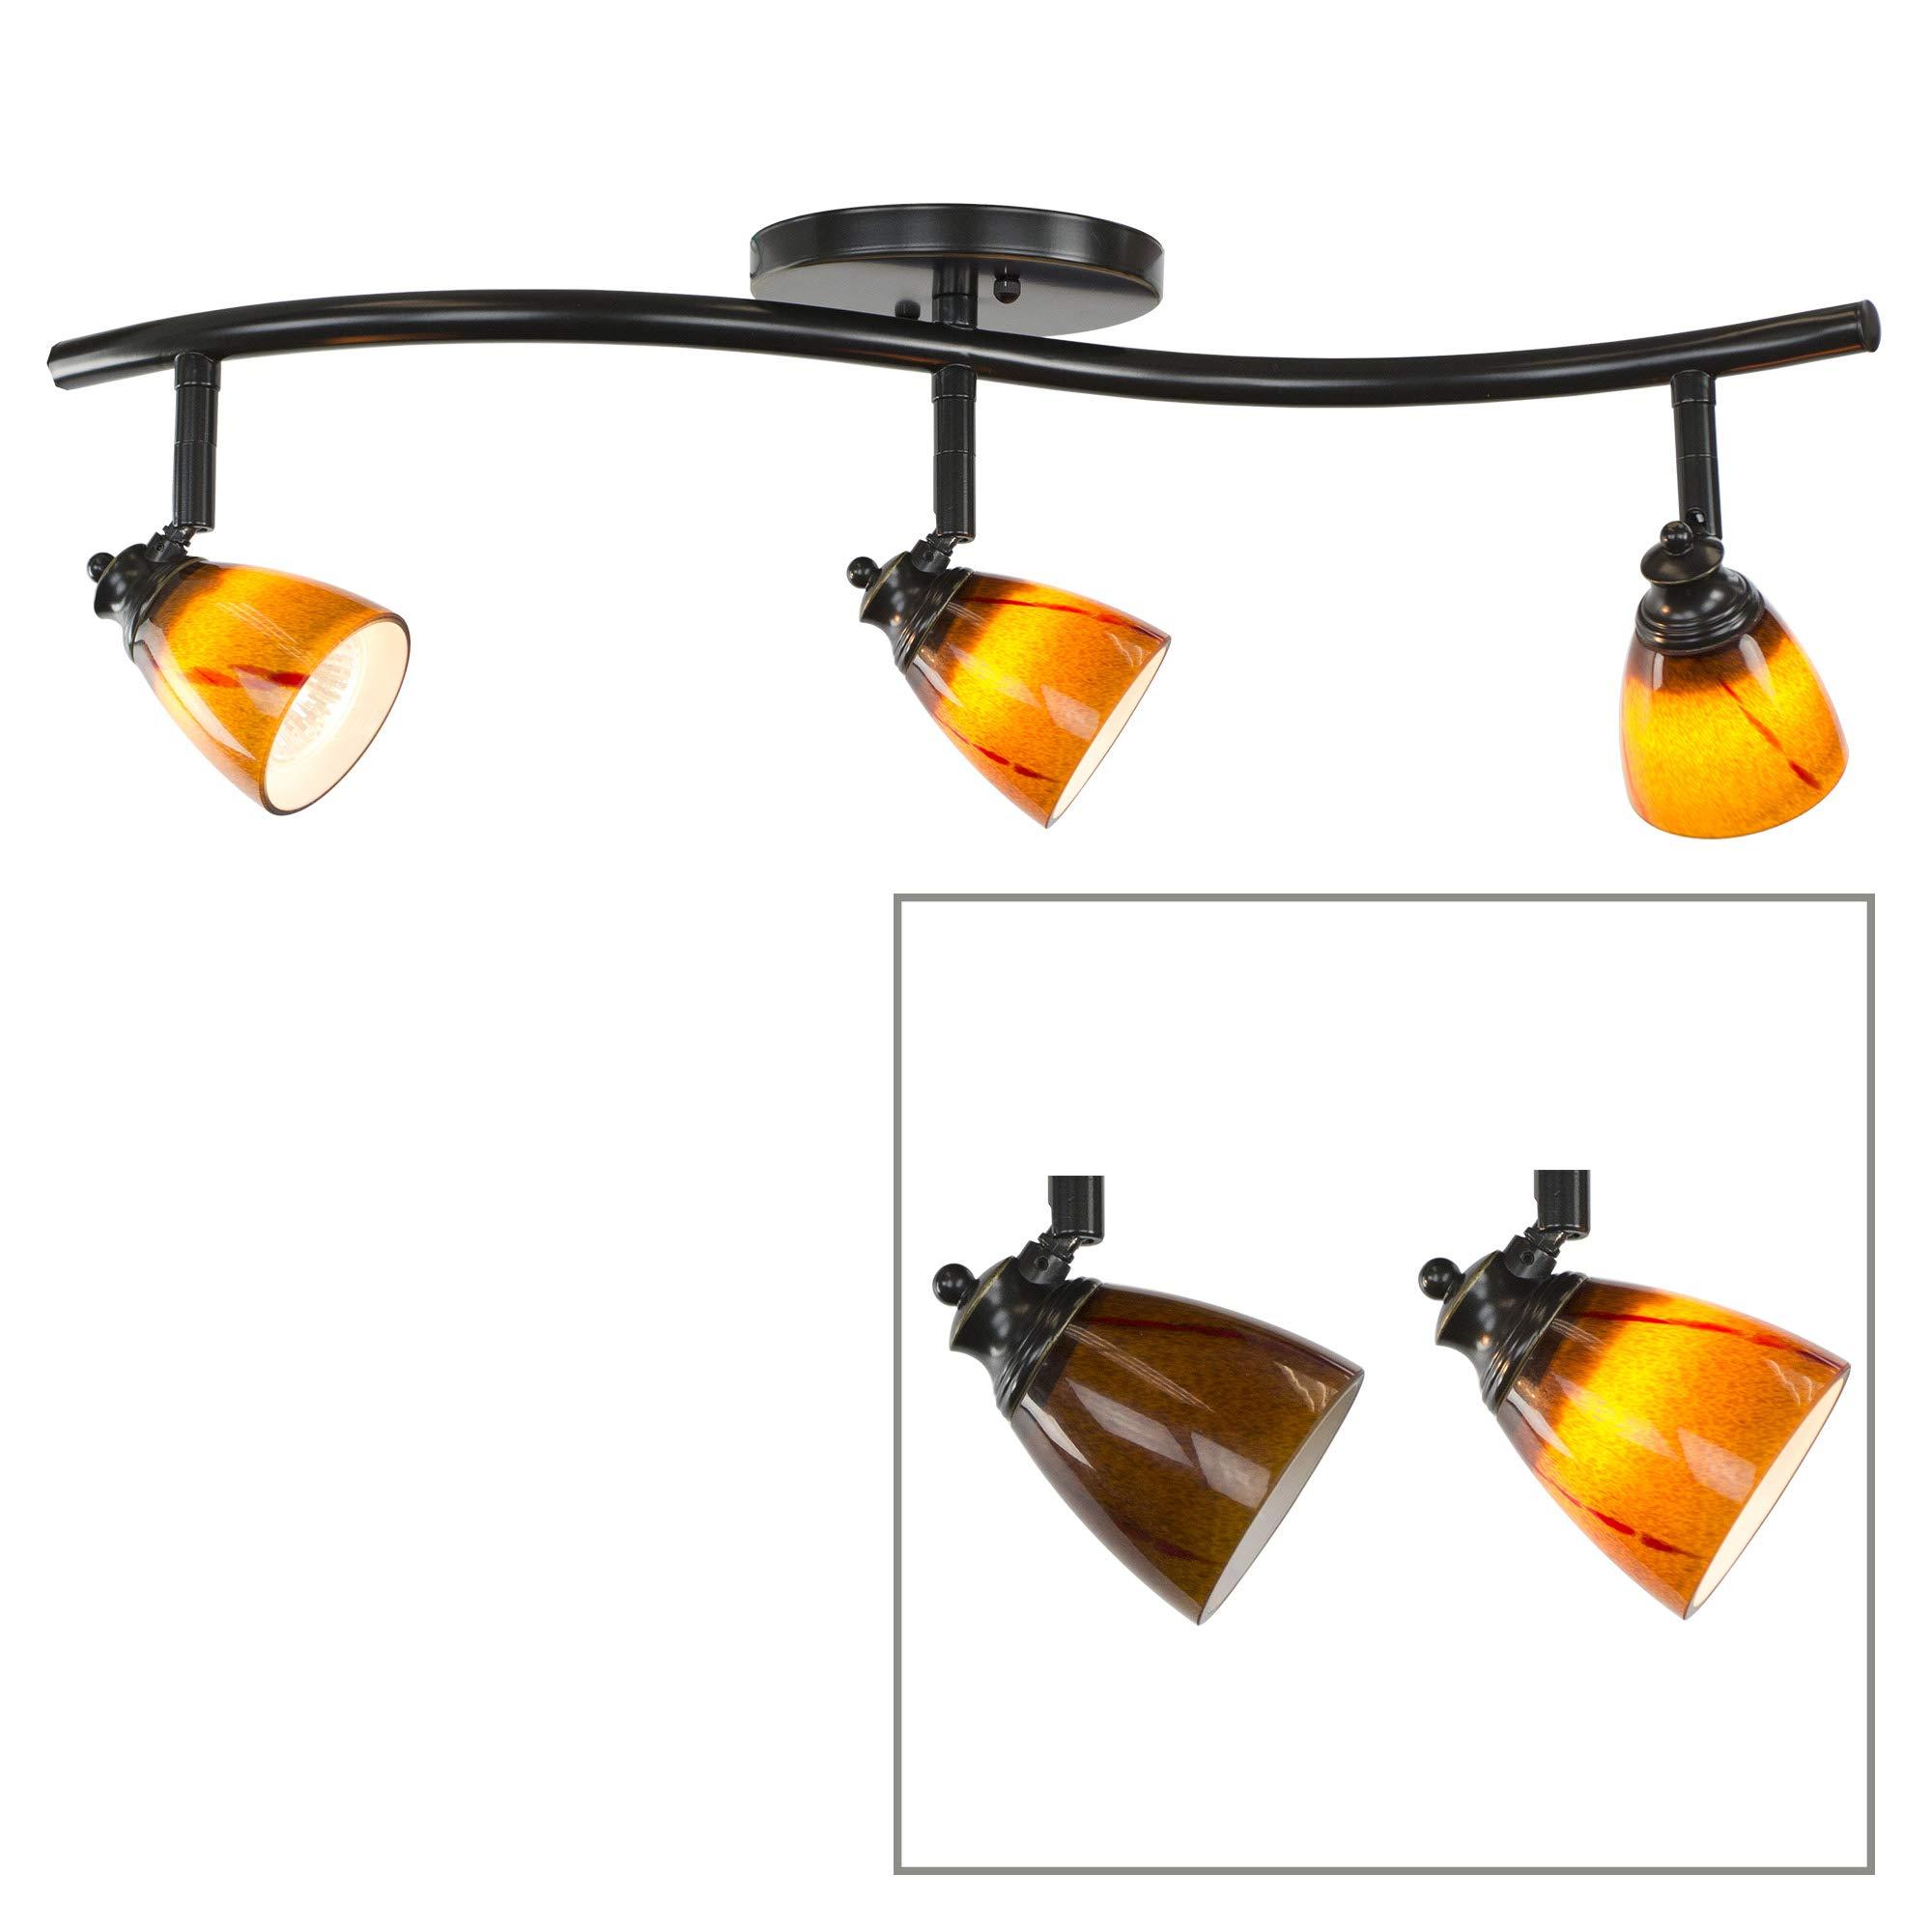 Direct-Lighting 3 Lights Adjustable Track Lighting Kit - Dark Bronze Finish - Amber Glass Track Heads - GU10 Bulbs Included. D268-23C-DB-AMS by Direct-Lighting